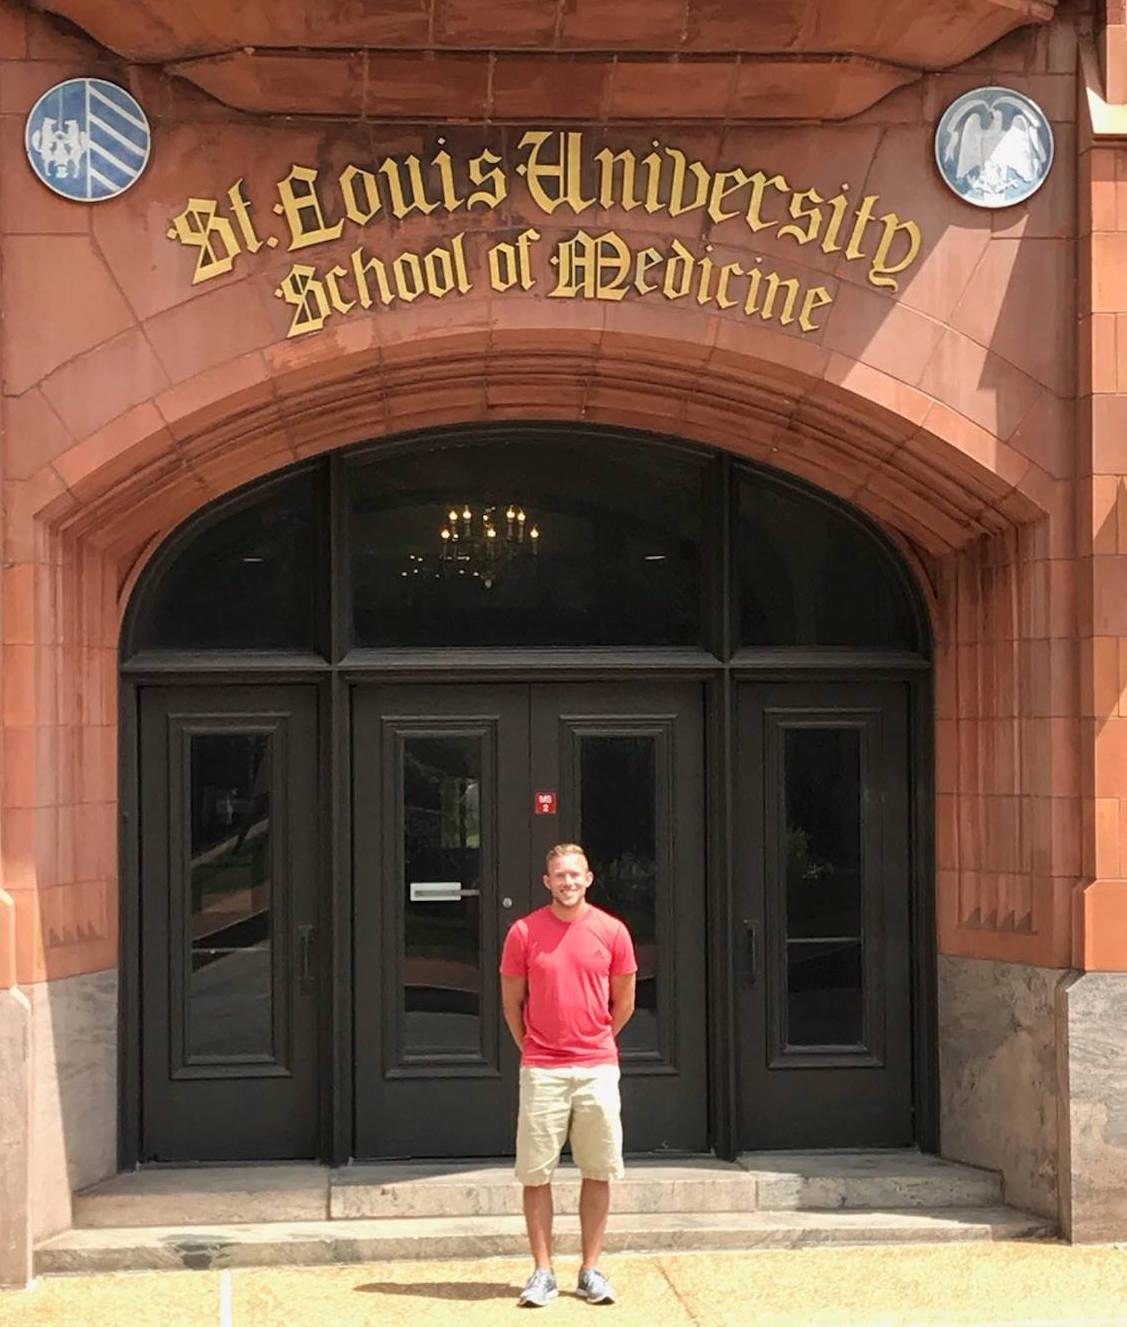 Luke Buttke SLU Entrance 2018.jpg